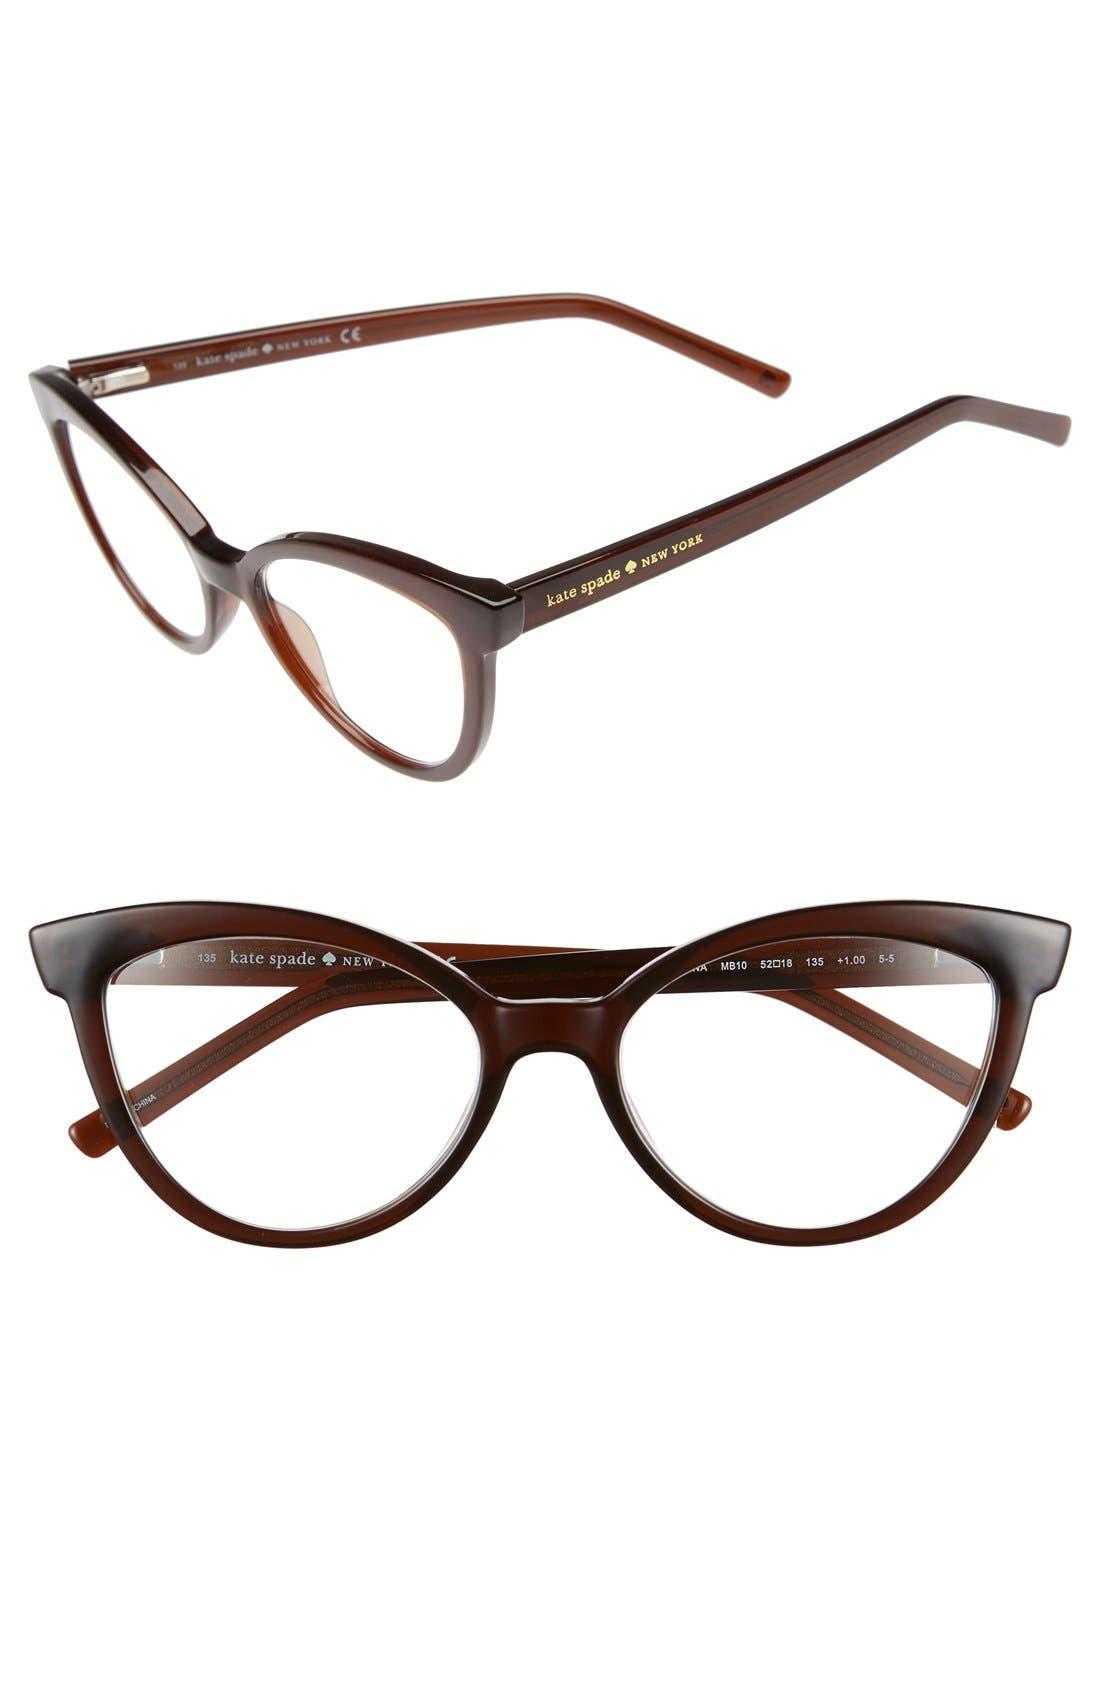 Main Image - kate spade new york 'danna' 52mm cat eye reading glasses